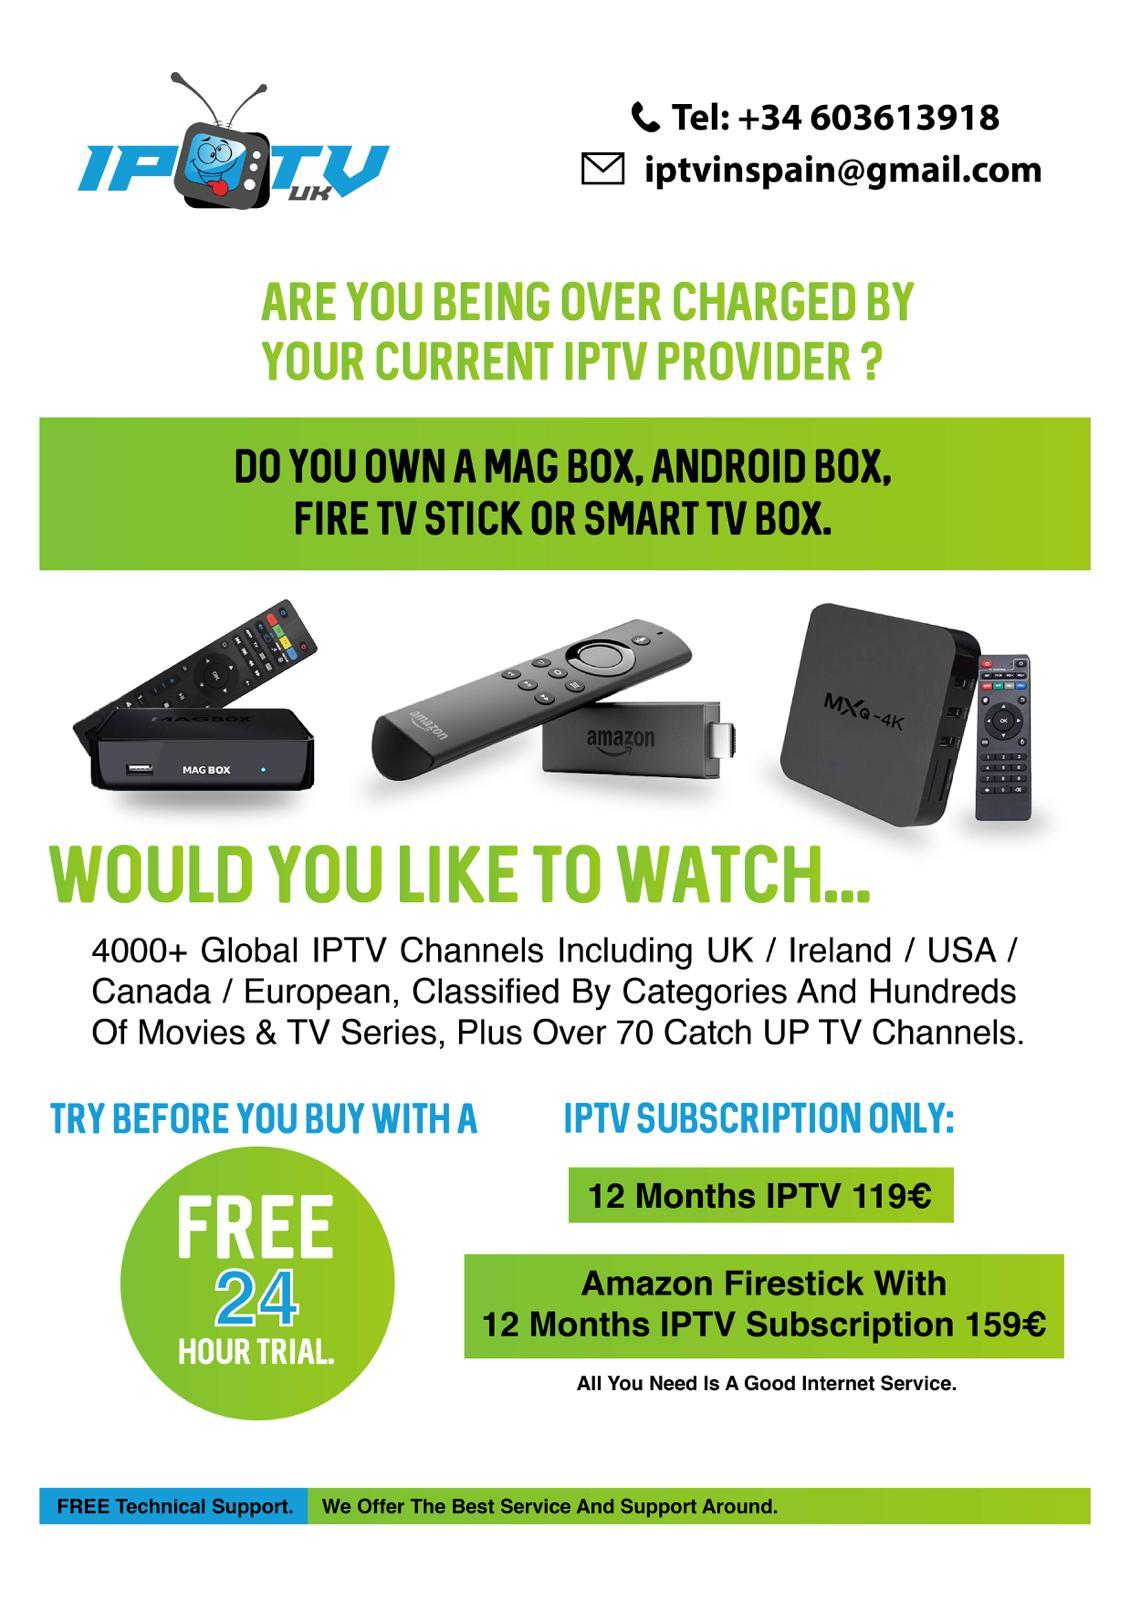 IPTV UK in Vera Playa: address, telephone number and opening